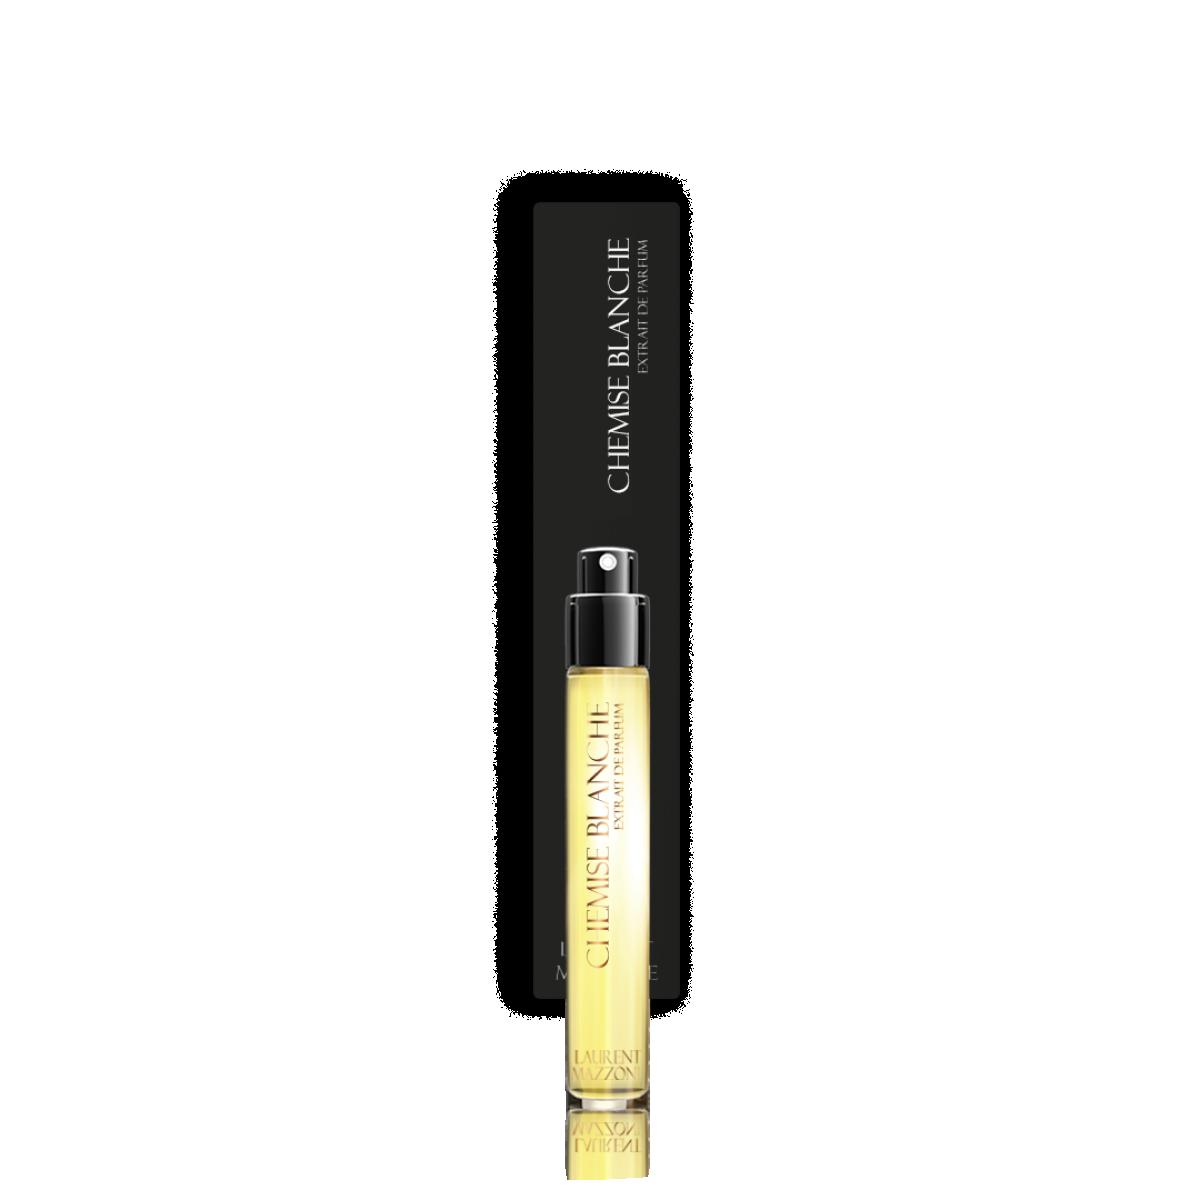 CHEMISE BLANCHE - LM Parfums